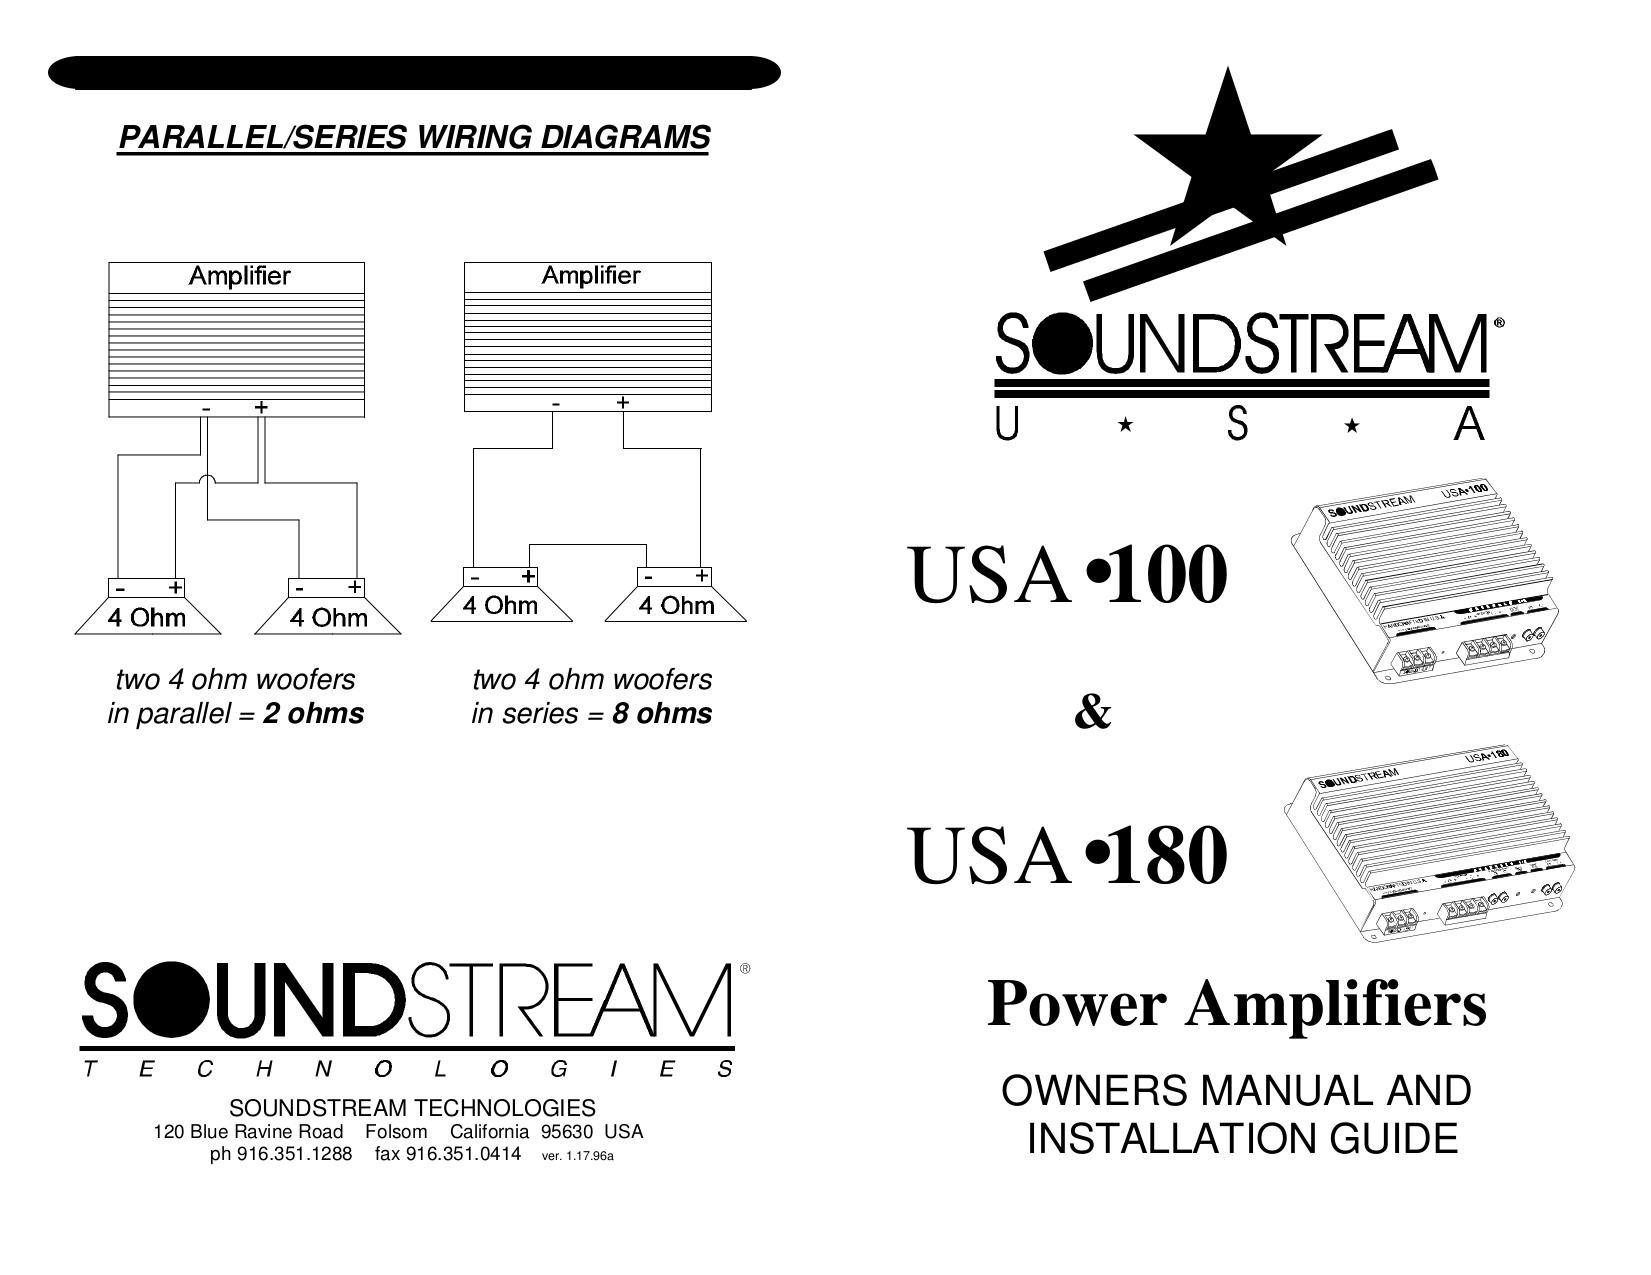 pdf for soundstream usa subwoofer manual pdf for soundstream subwoofer usa 15 manual